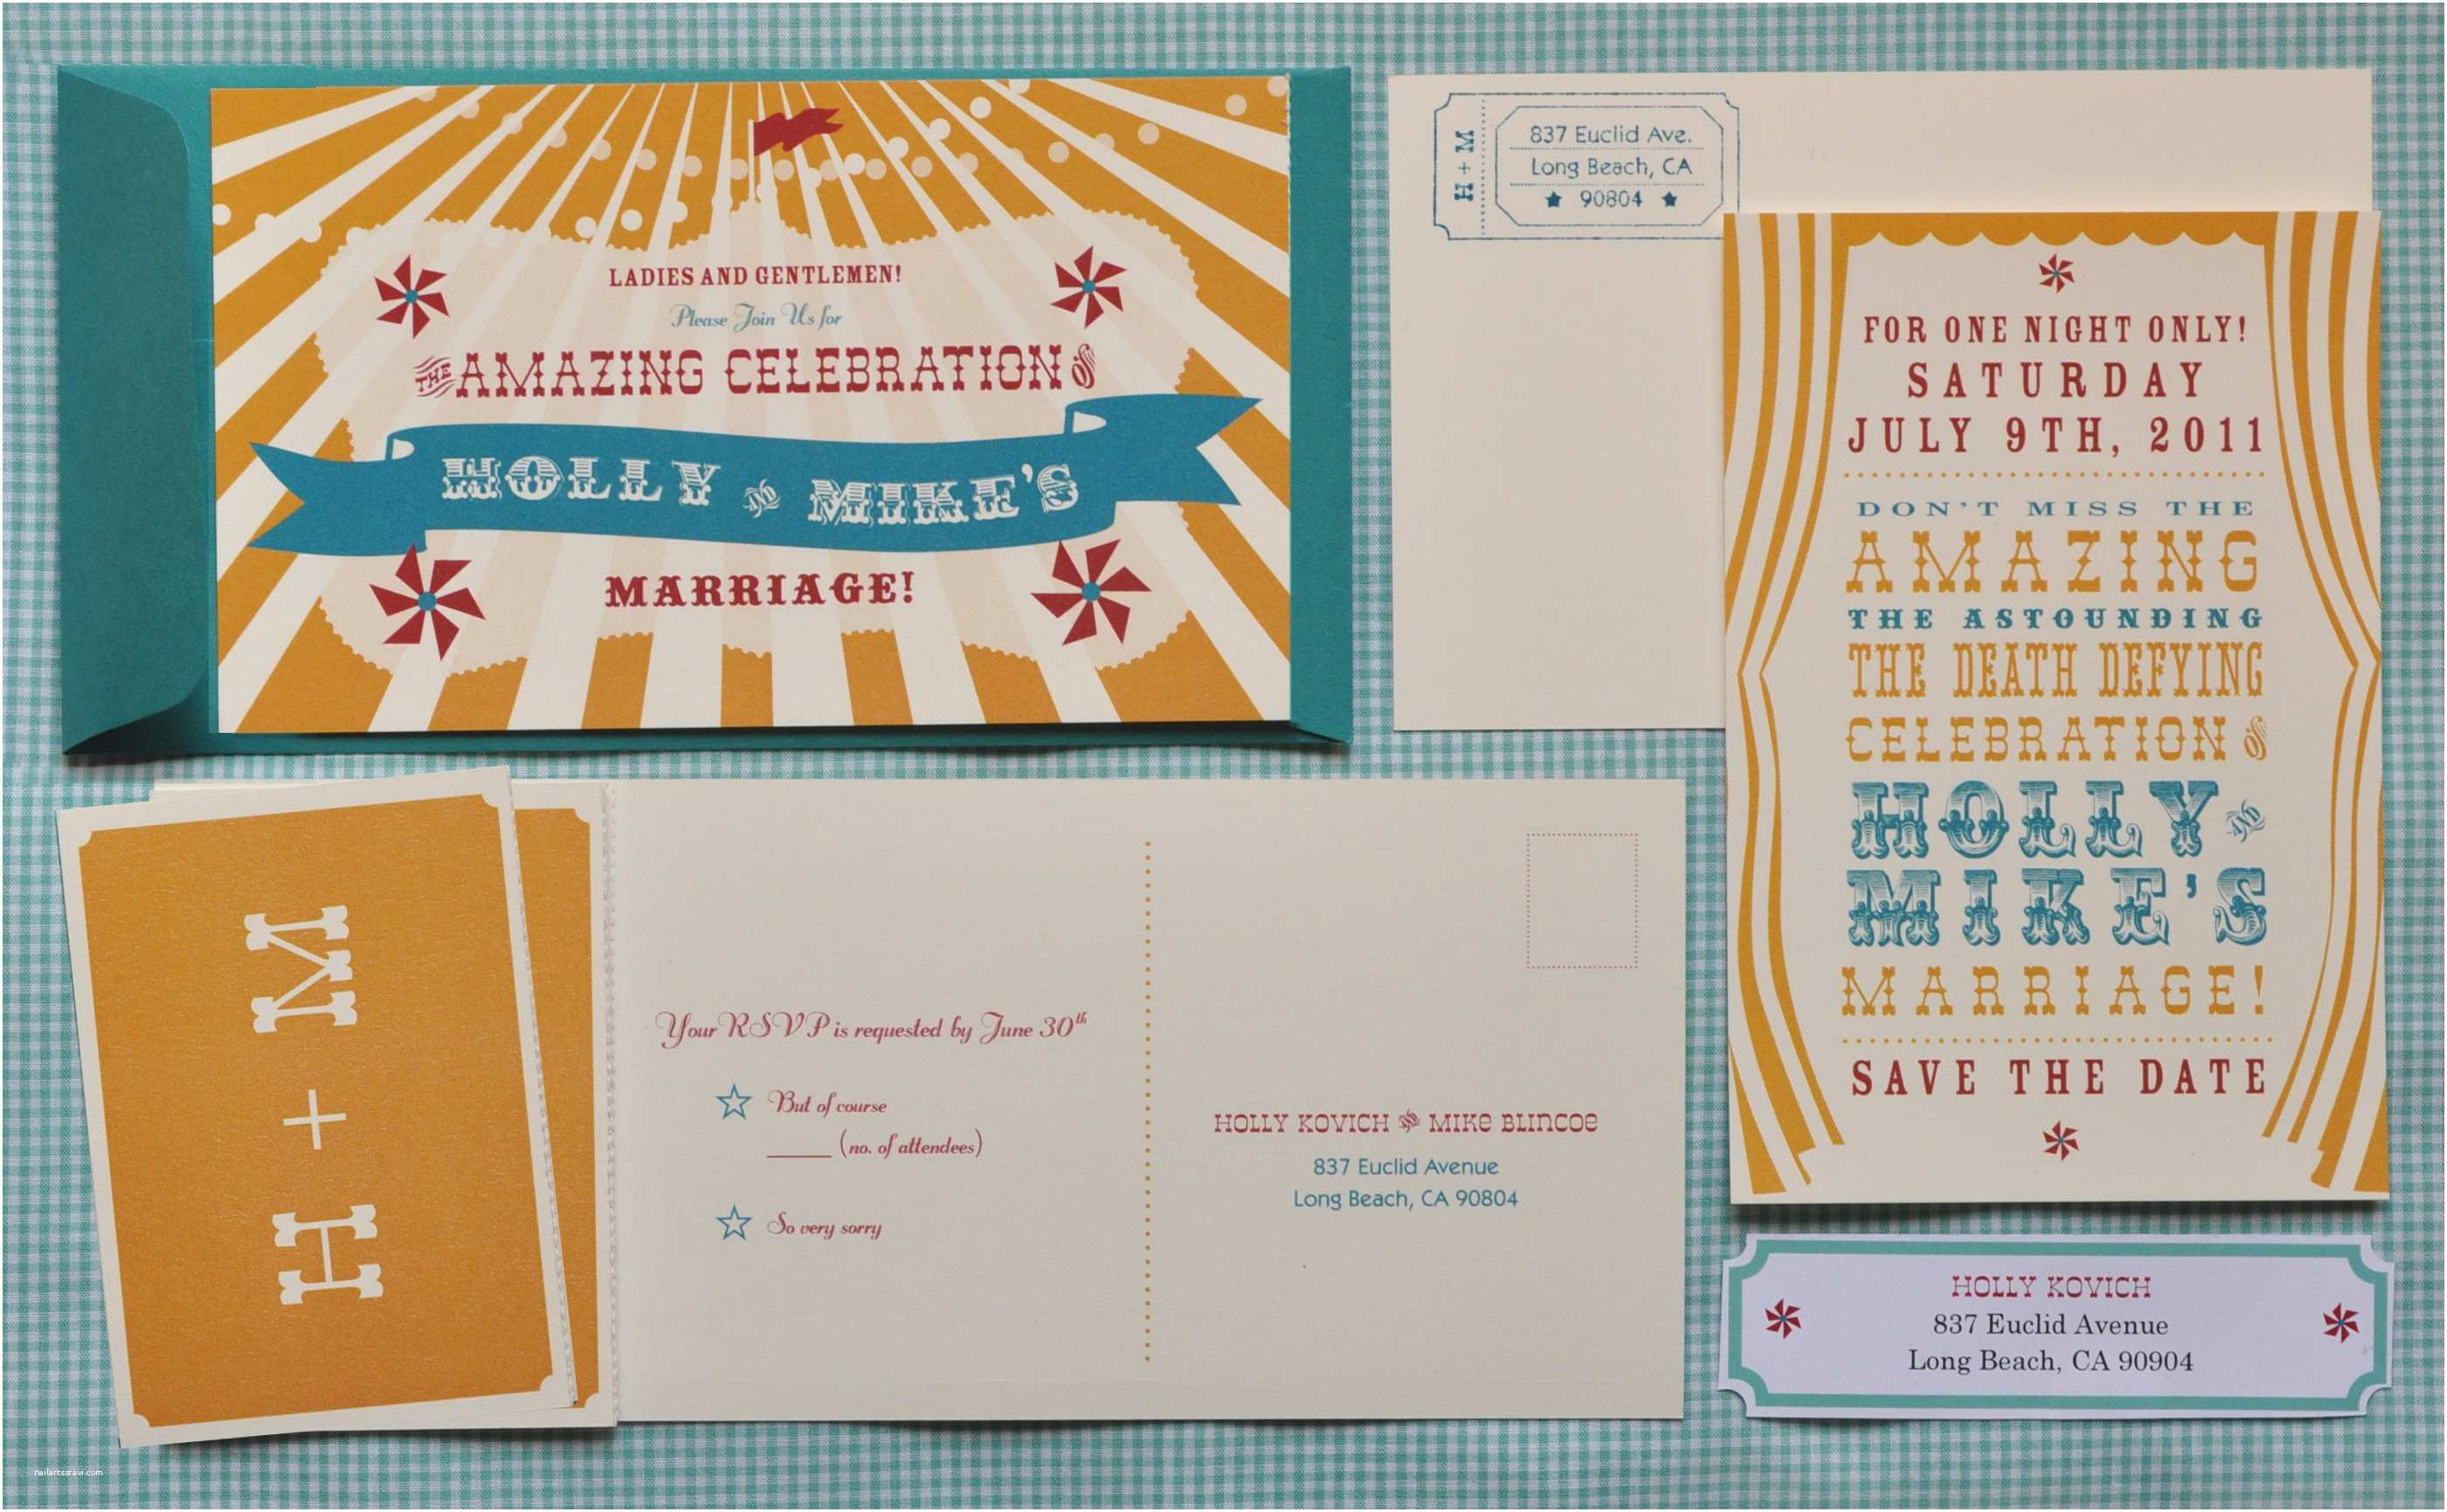 Wedding Invitation Card Maker Free Circus Wedding Invitations Invitation Maker Desi